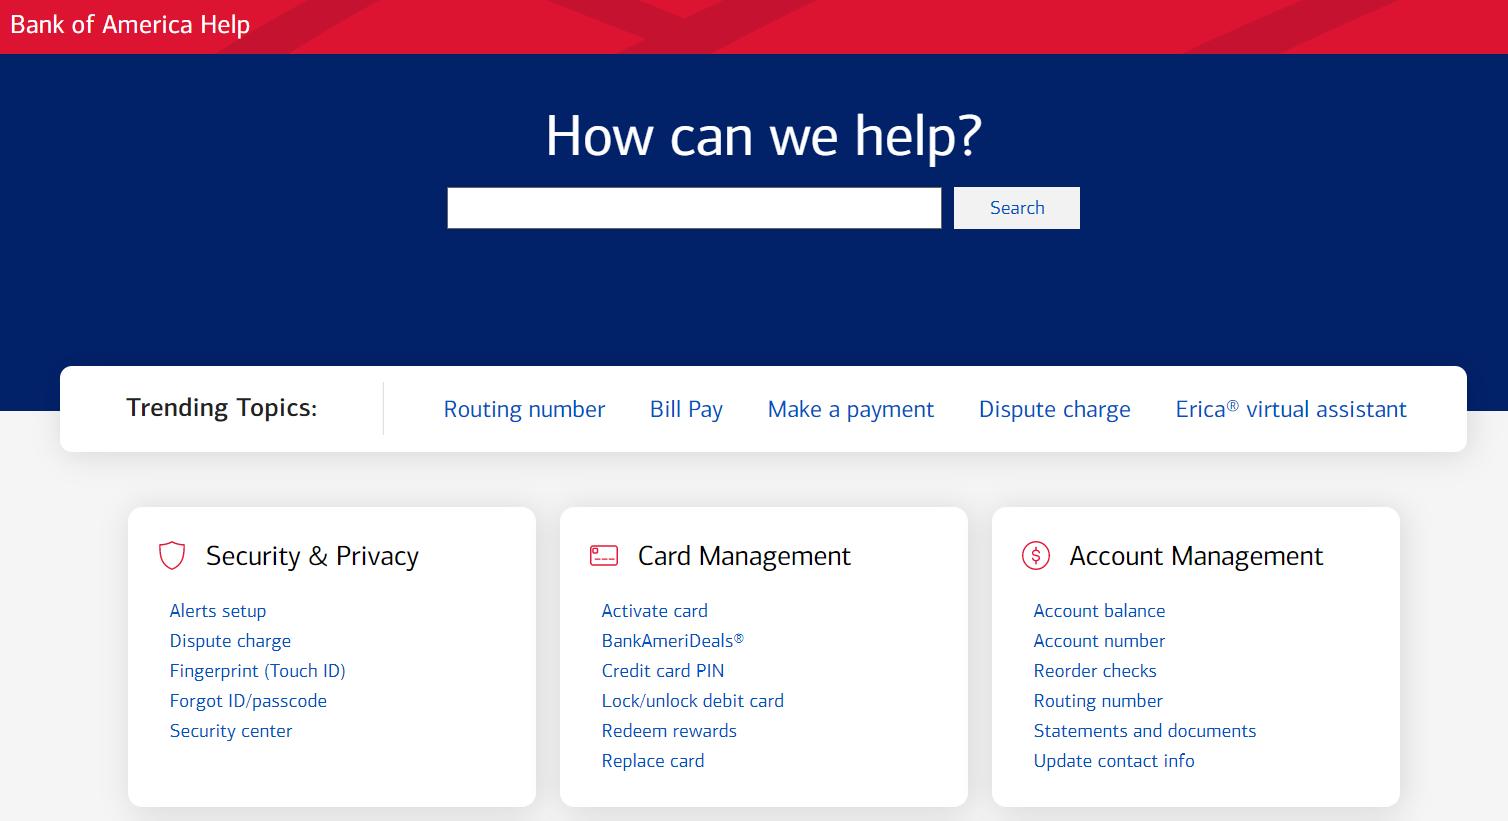 Bank Of America Help FAQ section